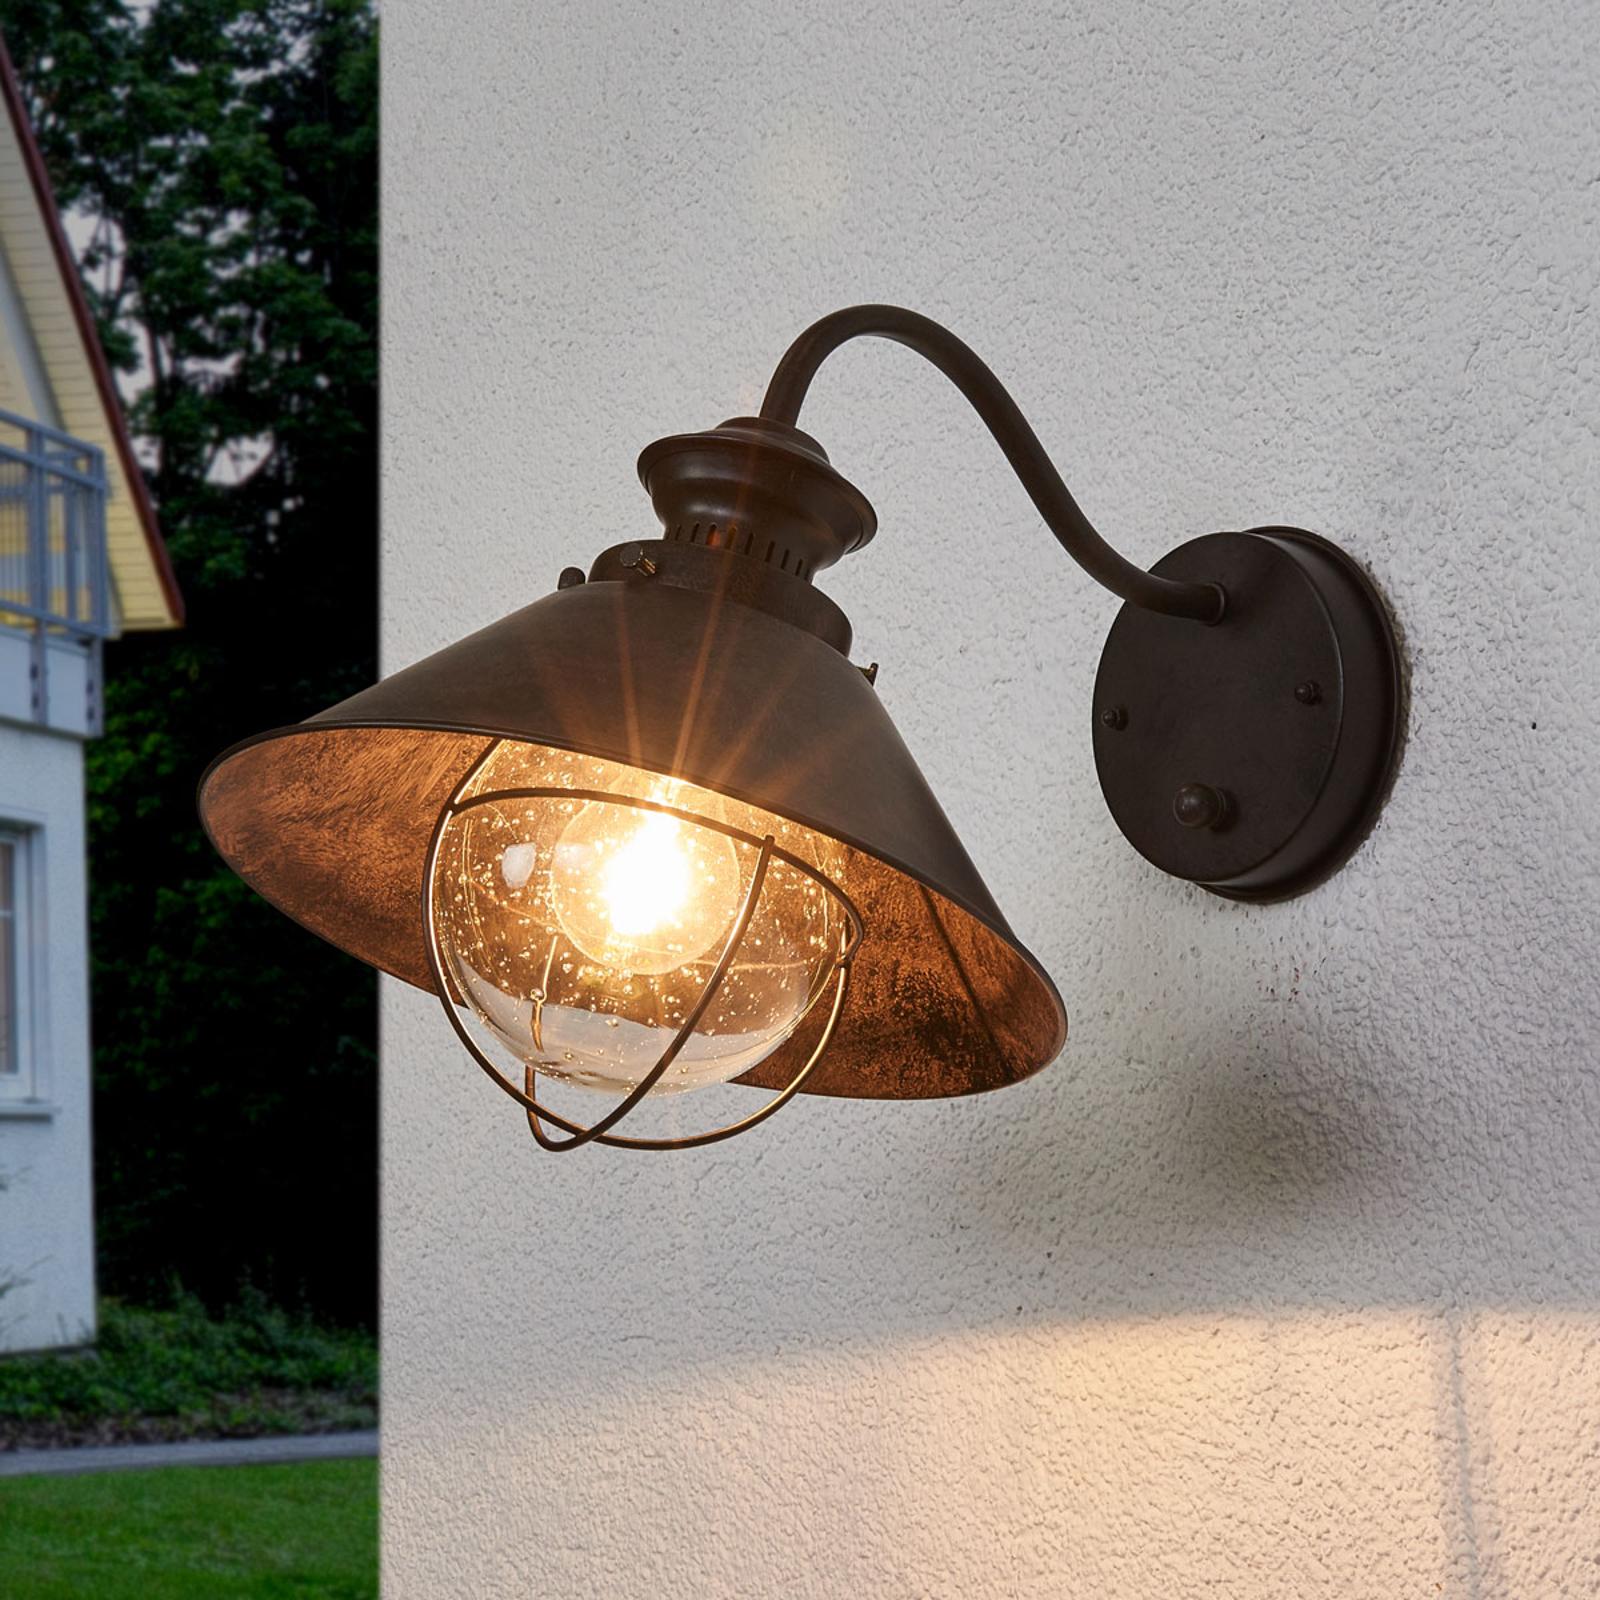 Nautica Rustic Exterior Wall Lamp_3505154_1